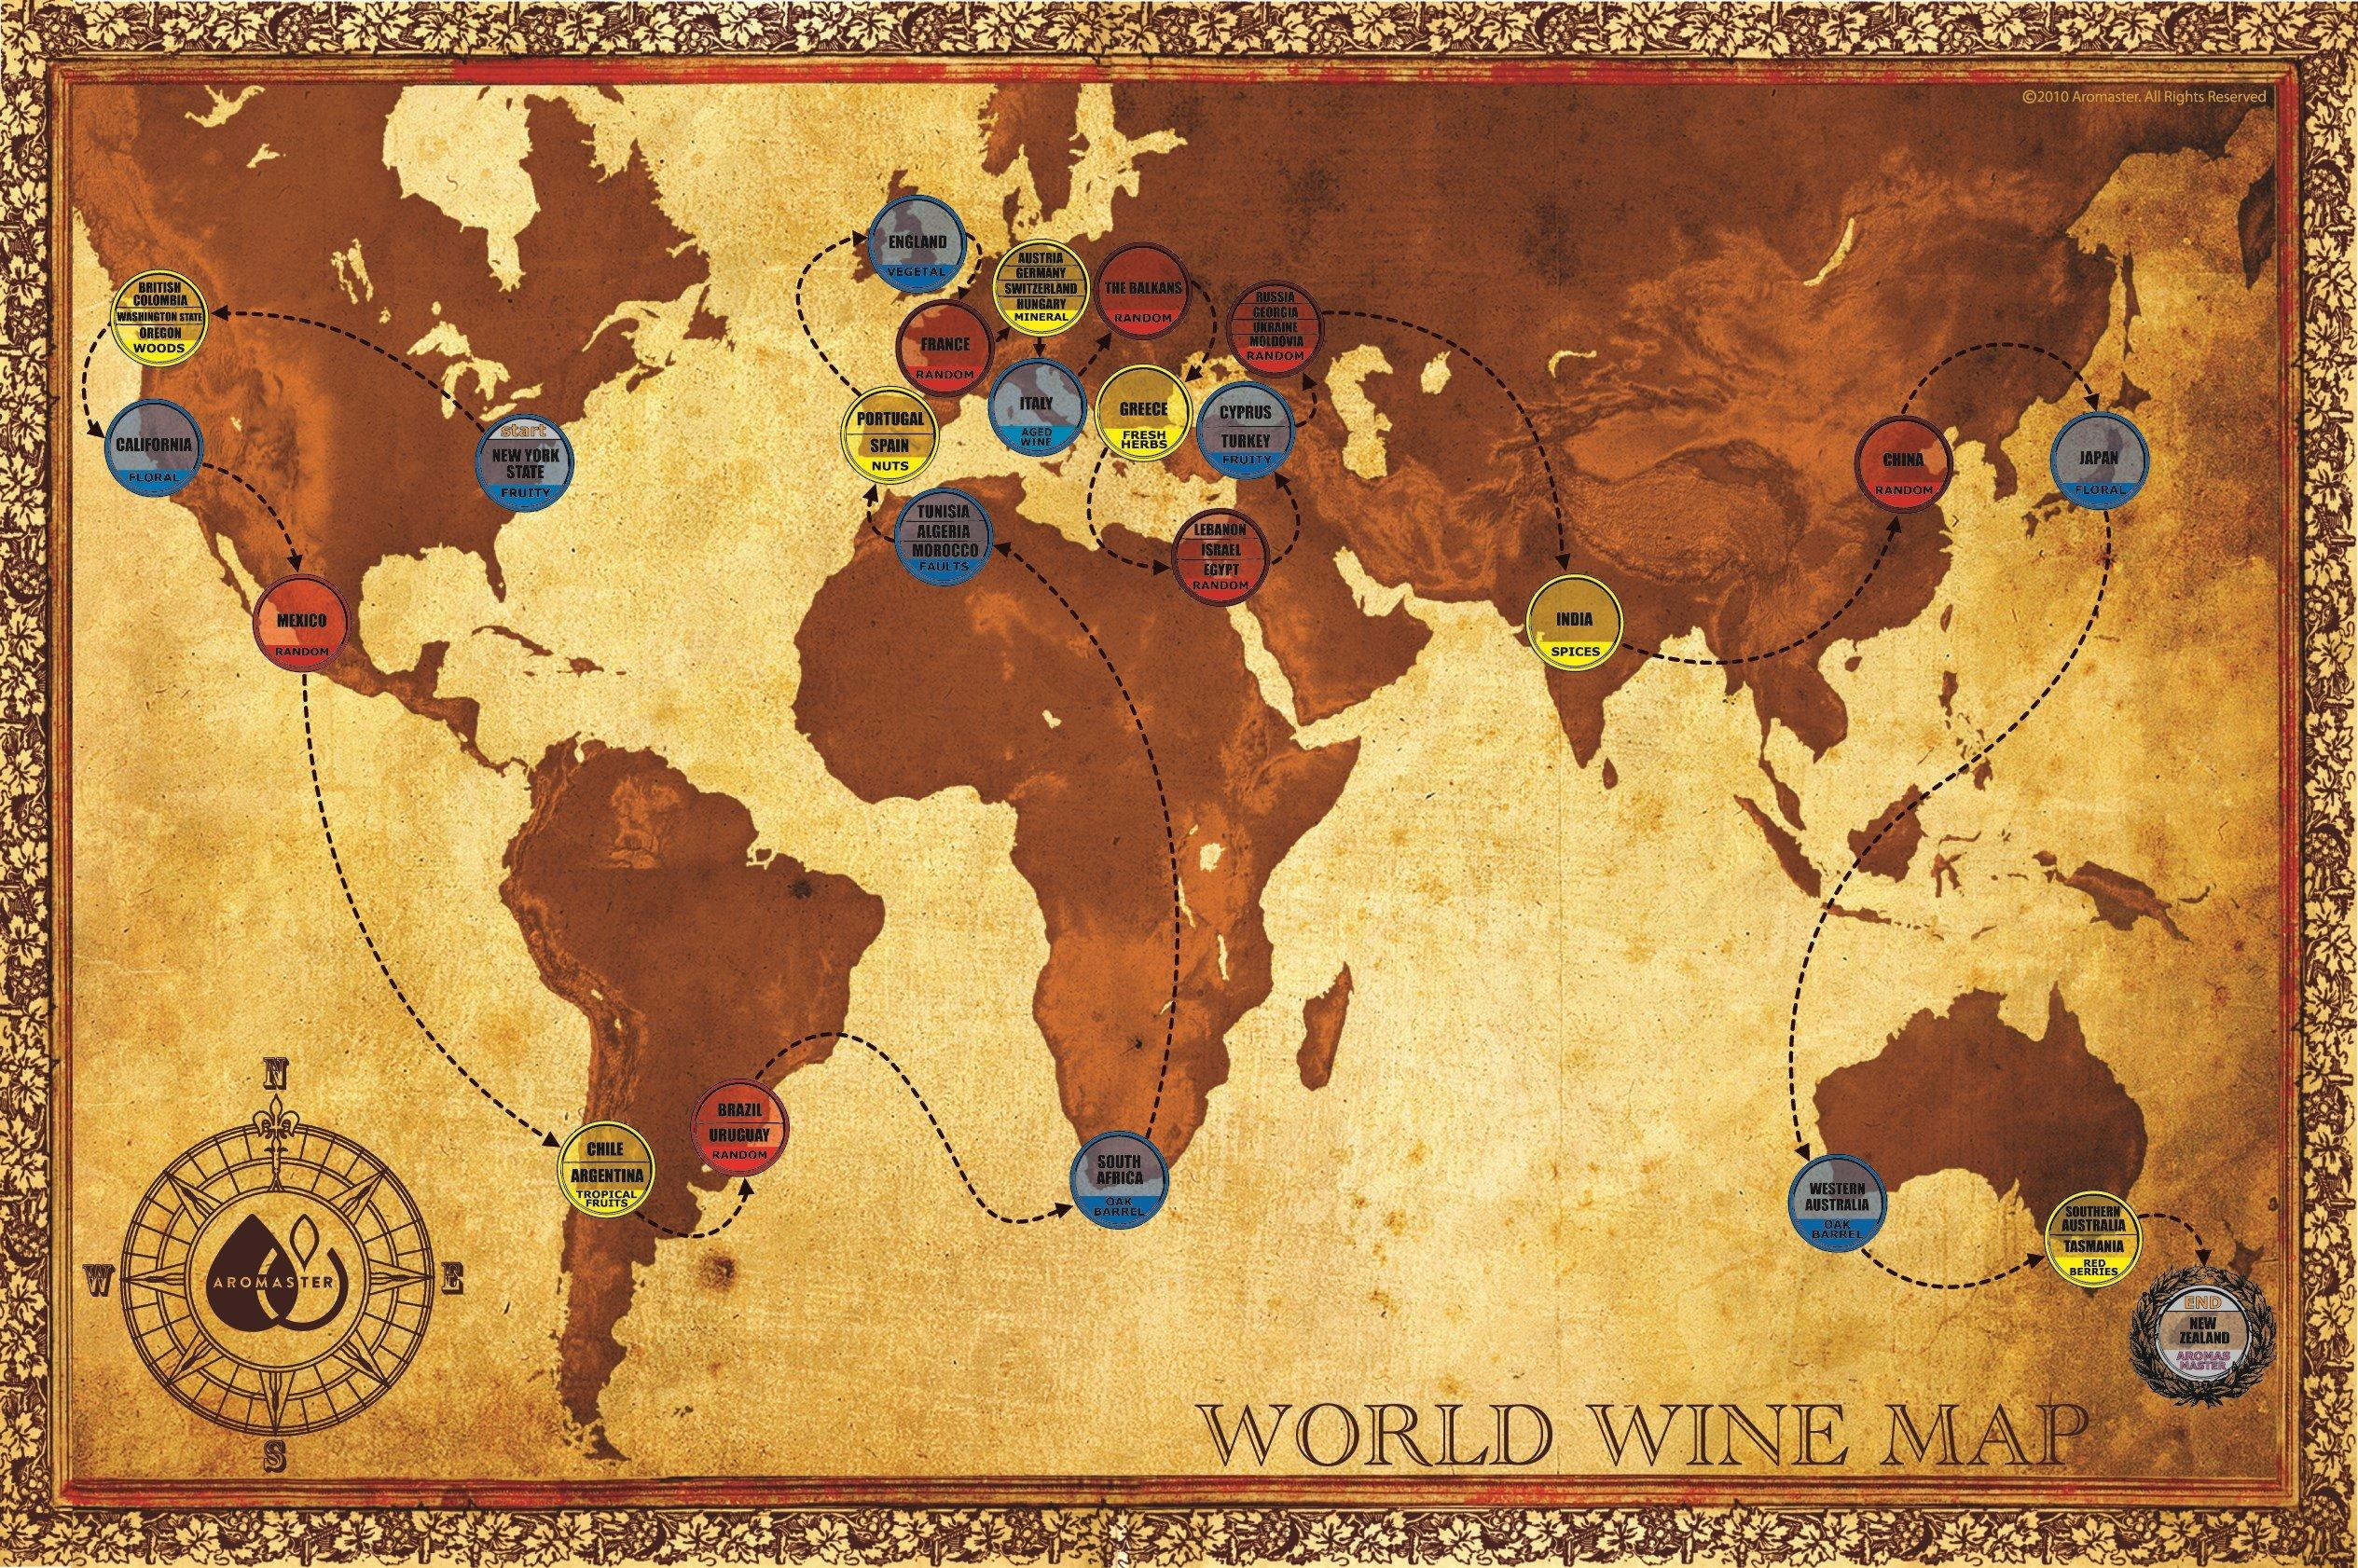 Master Wine Aroma Tasting Kit - 88 aromas (game board included)